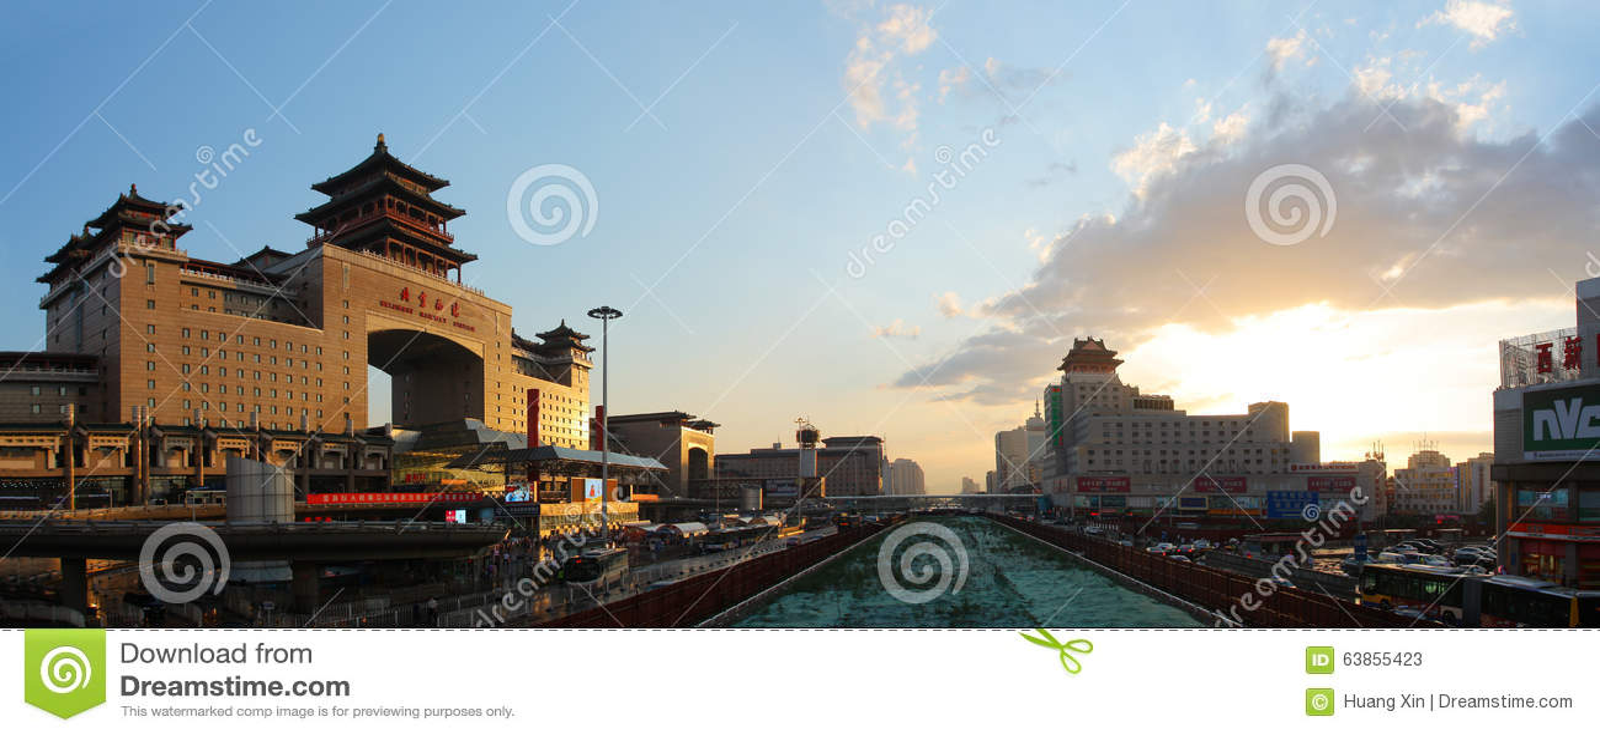 Bahnhof Pekings, Westbahnhof